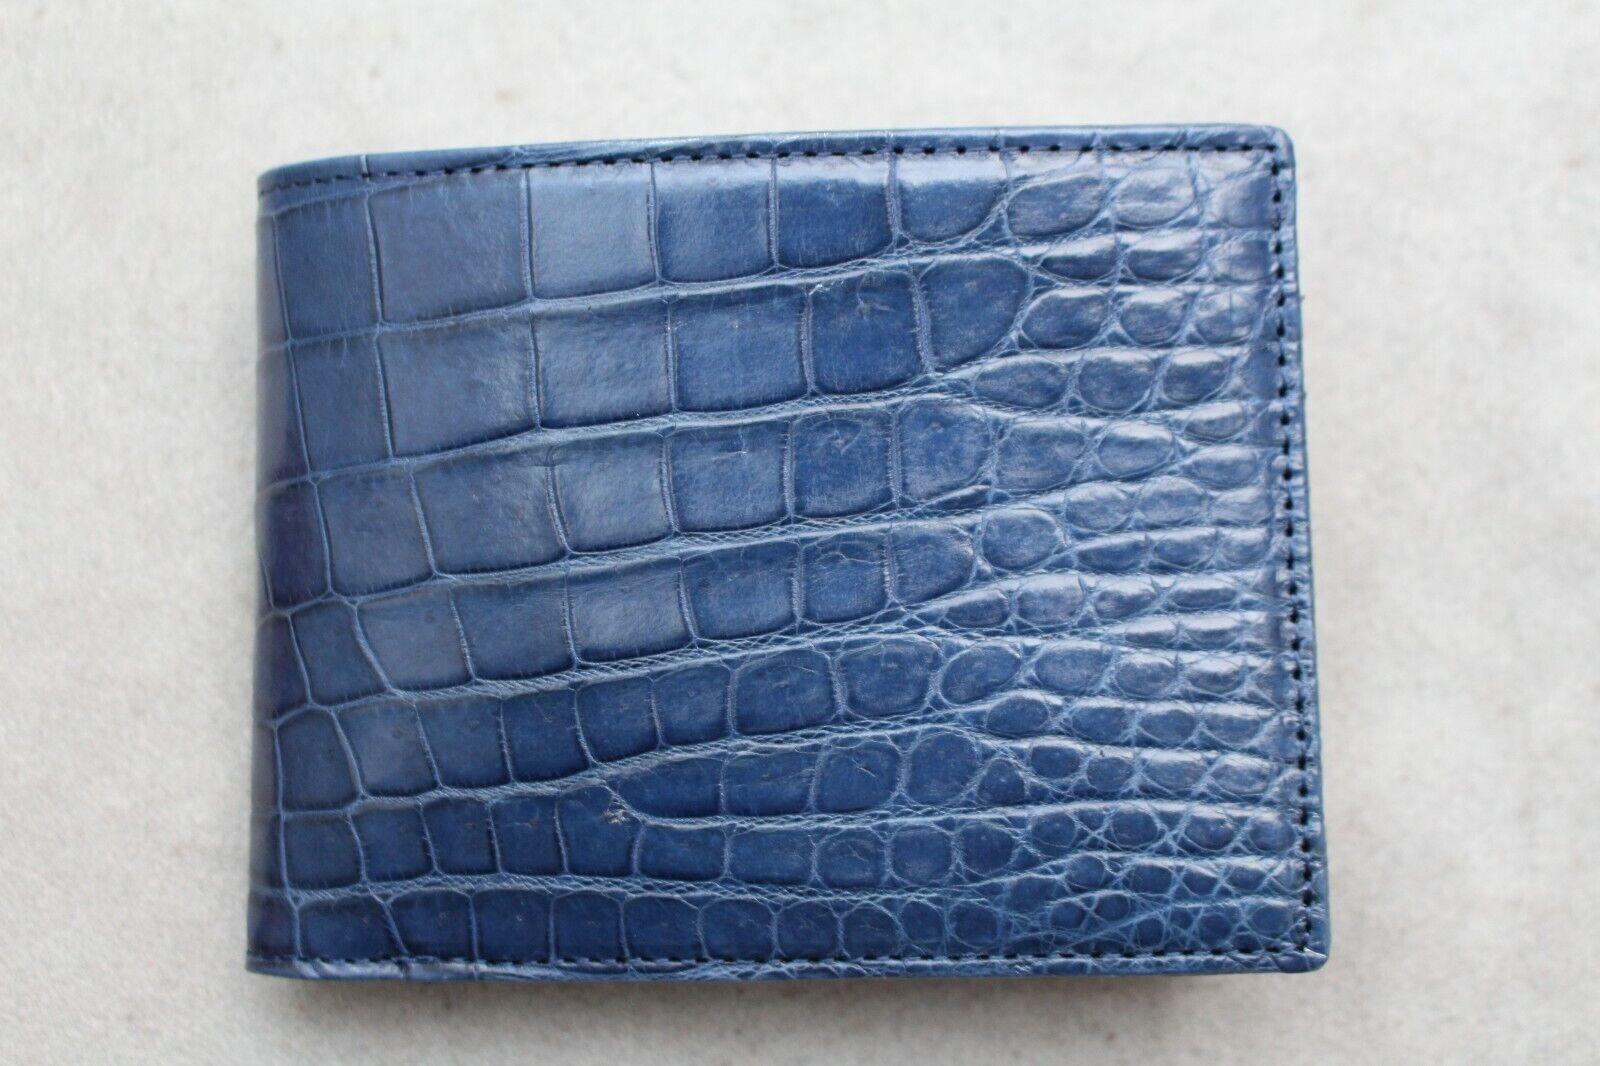 Blue Genuine Crocodile ,Alligator Belly Leather Skin MEN'S BIFOLD Wallet